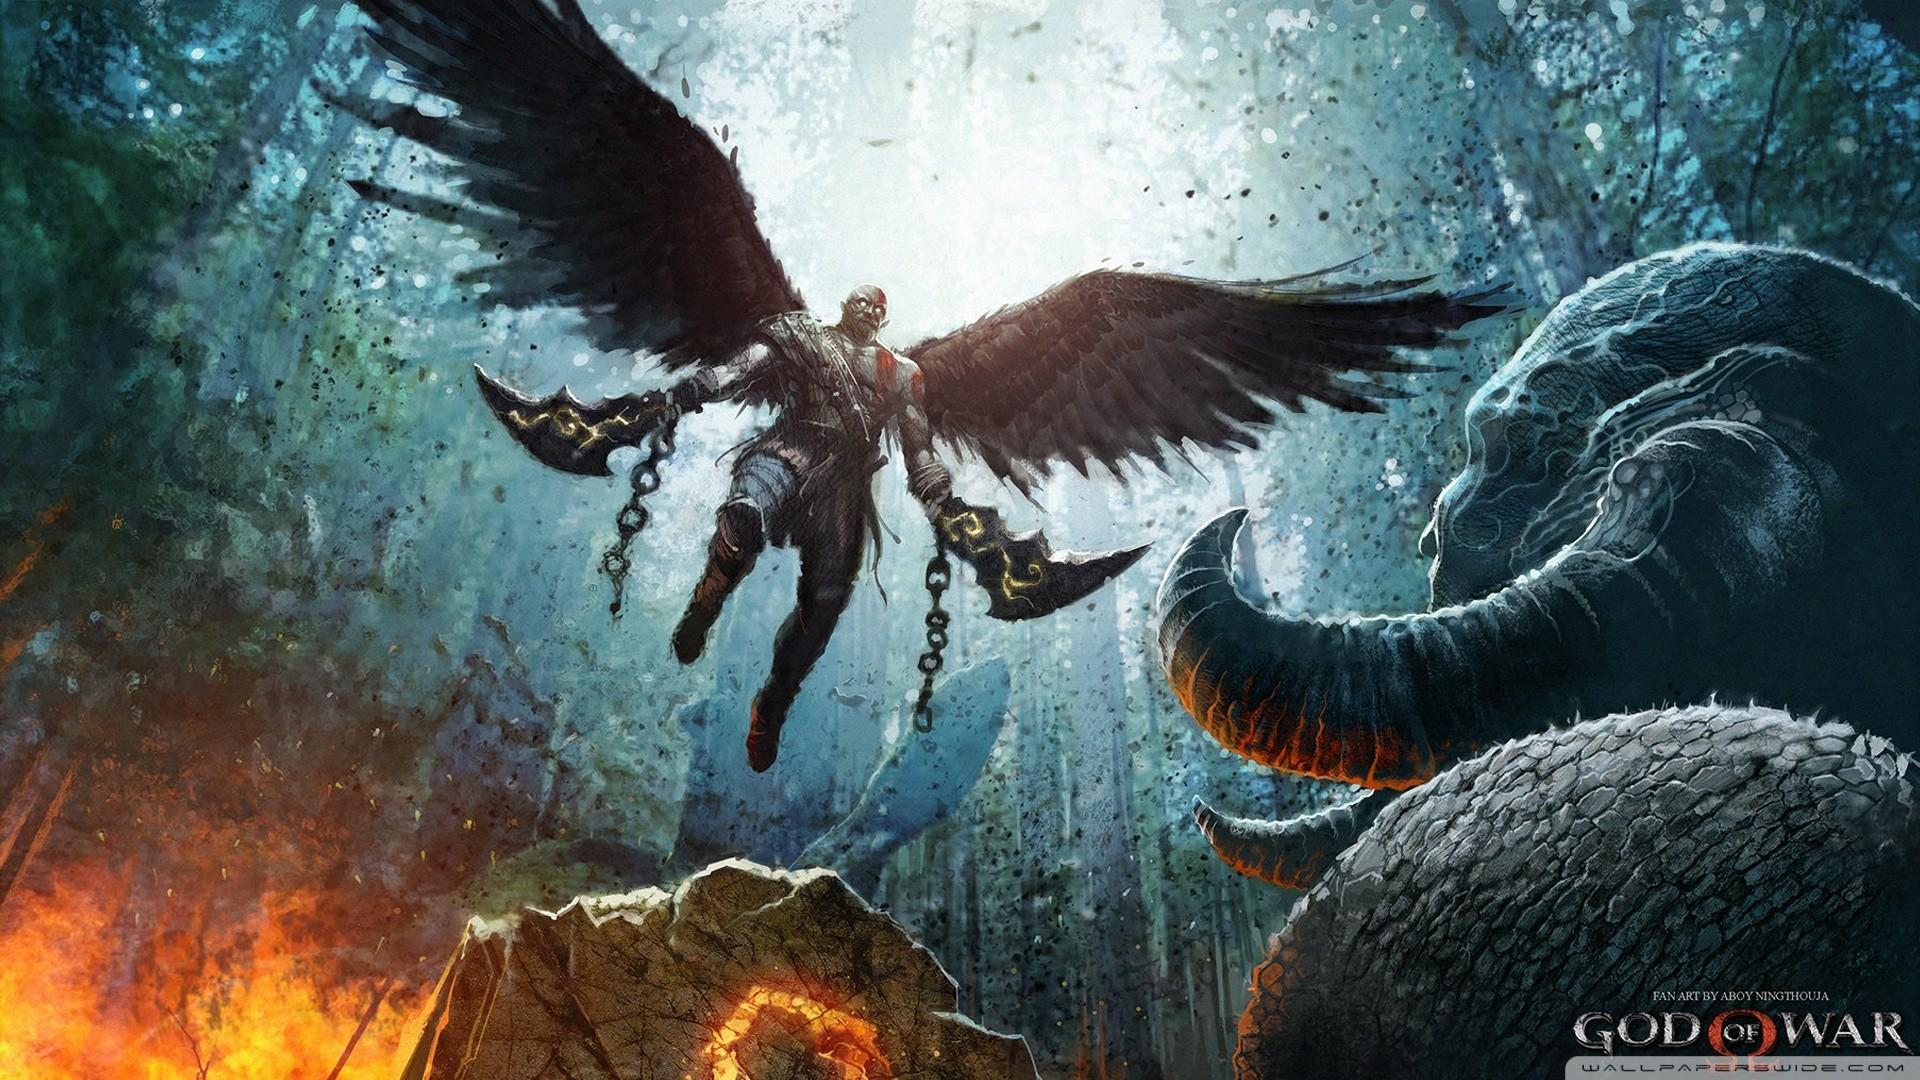 God of War PS4 2017 HD Wide Wallpaper for Widescreen